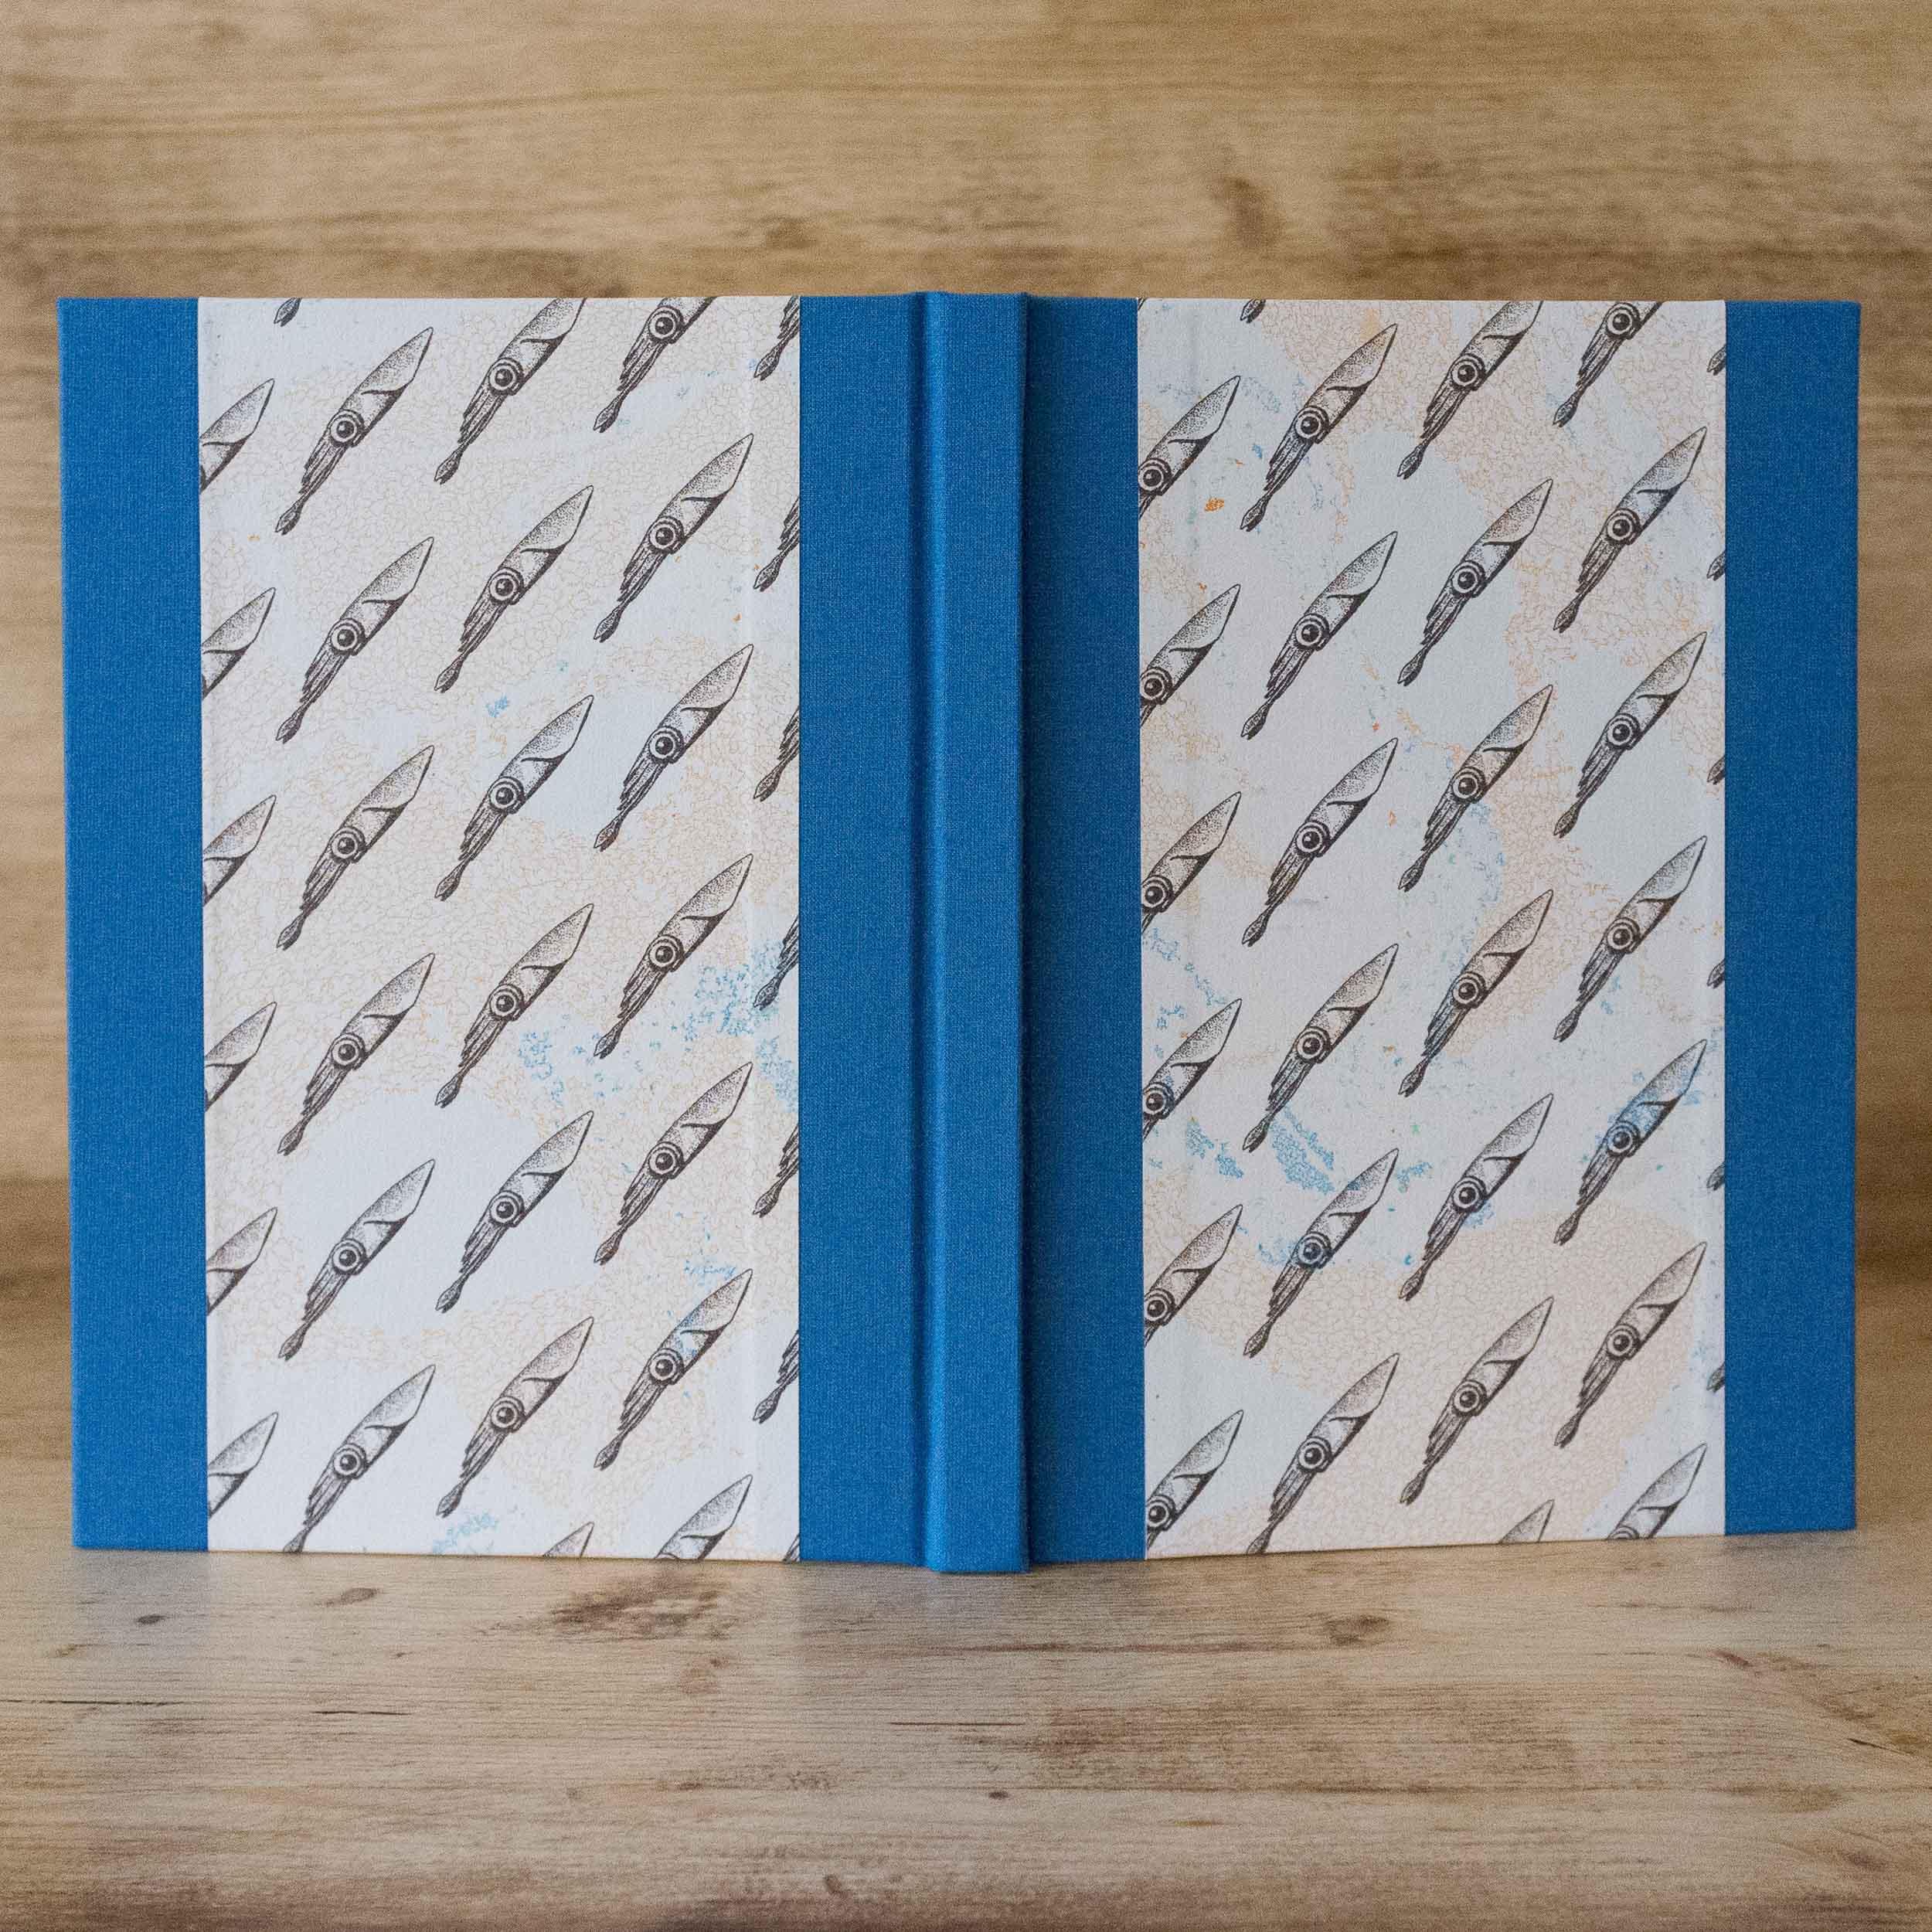 Camel Winter Hand Bound Books-1.jpg